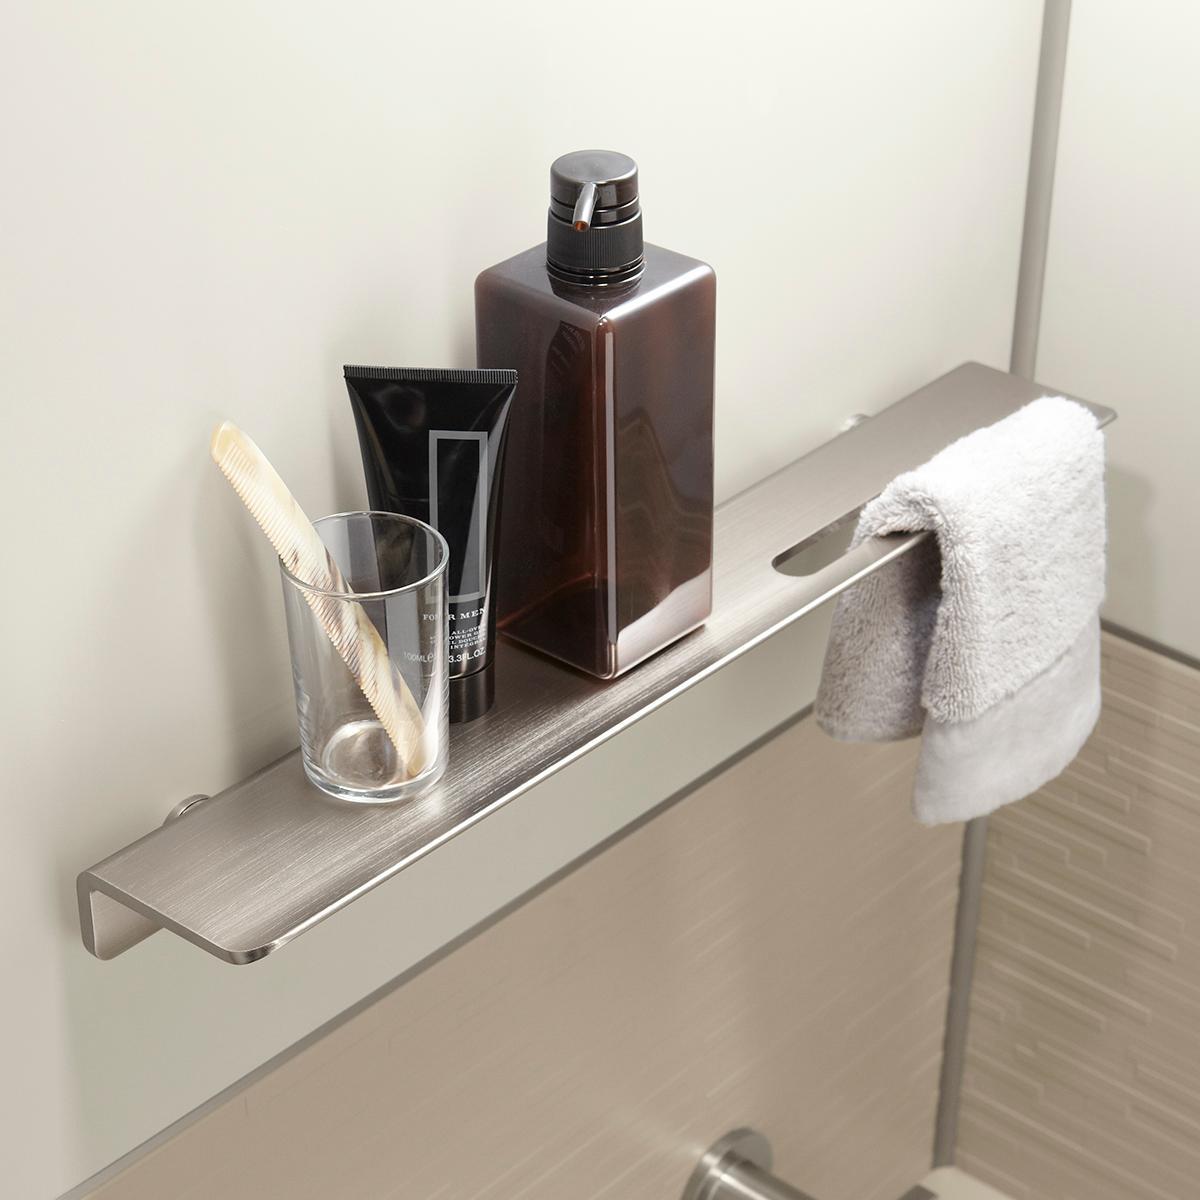 "Brushed Nickel Bathroom Shelving Unit: KOHLER K-97621-BNK Choreograph 7"" Floating Shower Shelf"